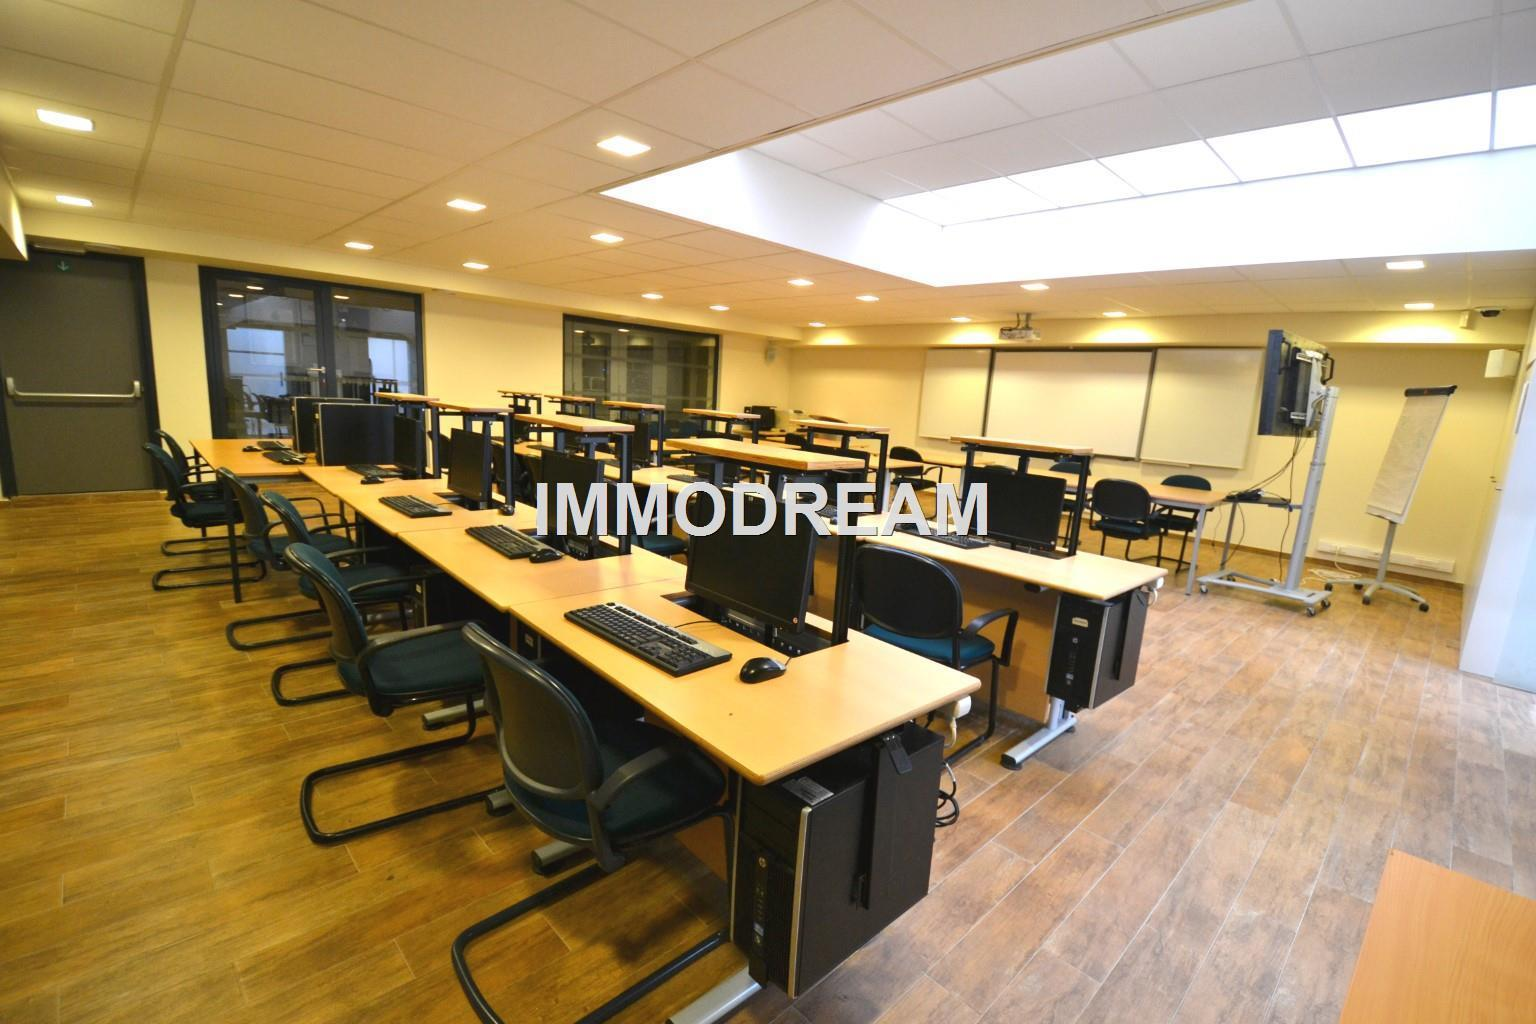 Mixt building off + res. - Woluwe-Saint-Lambert - #4025861-6